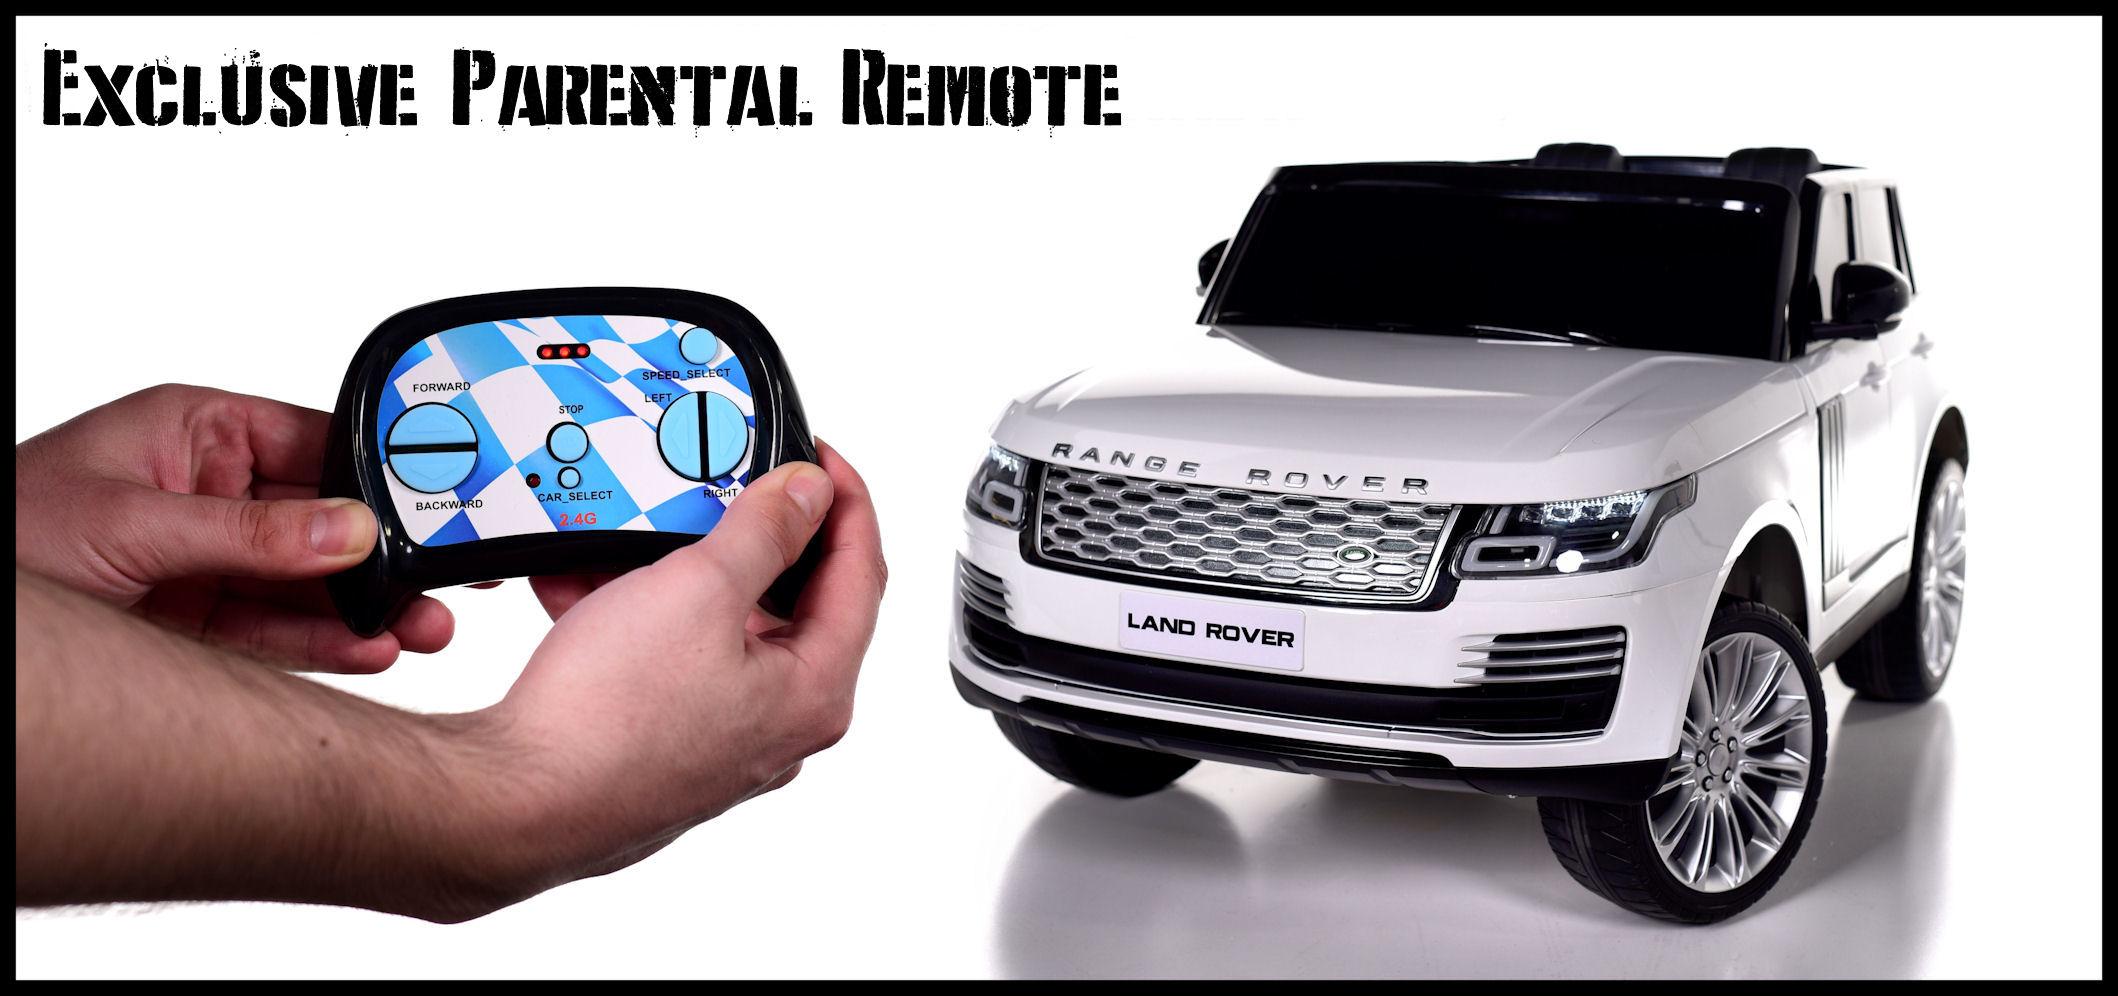 range-rover-remote.jpg